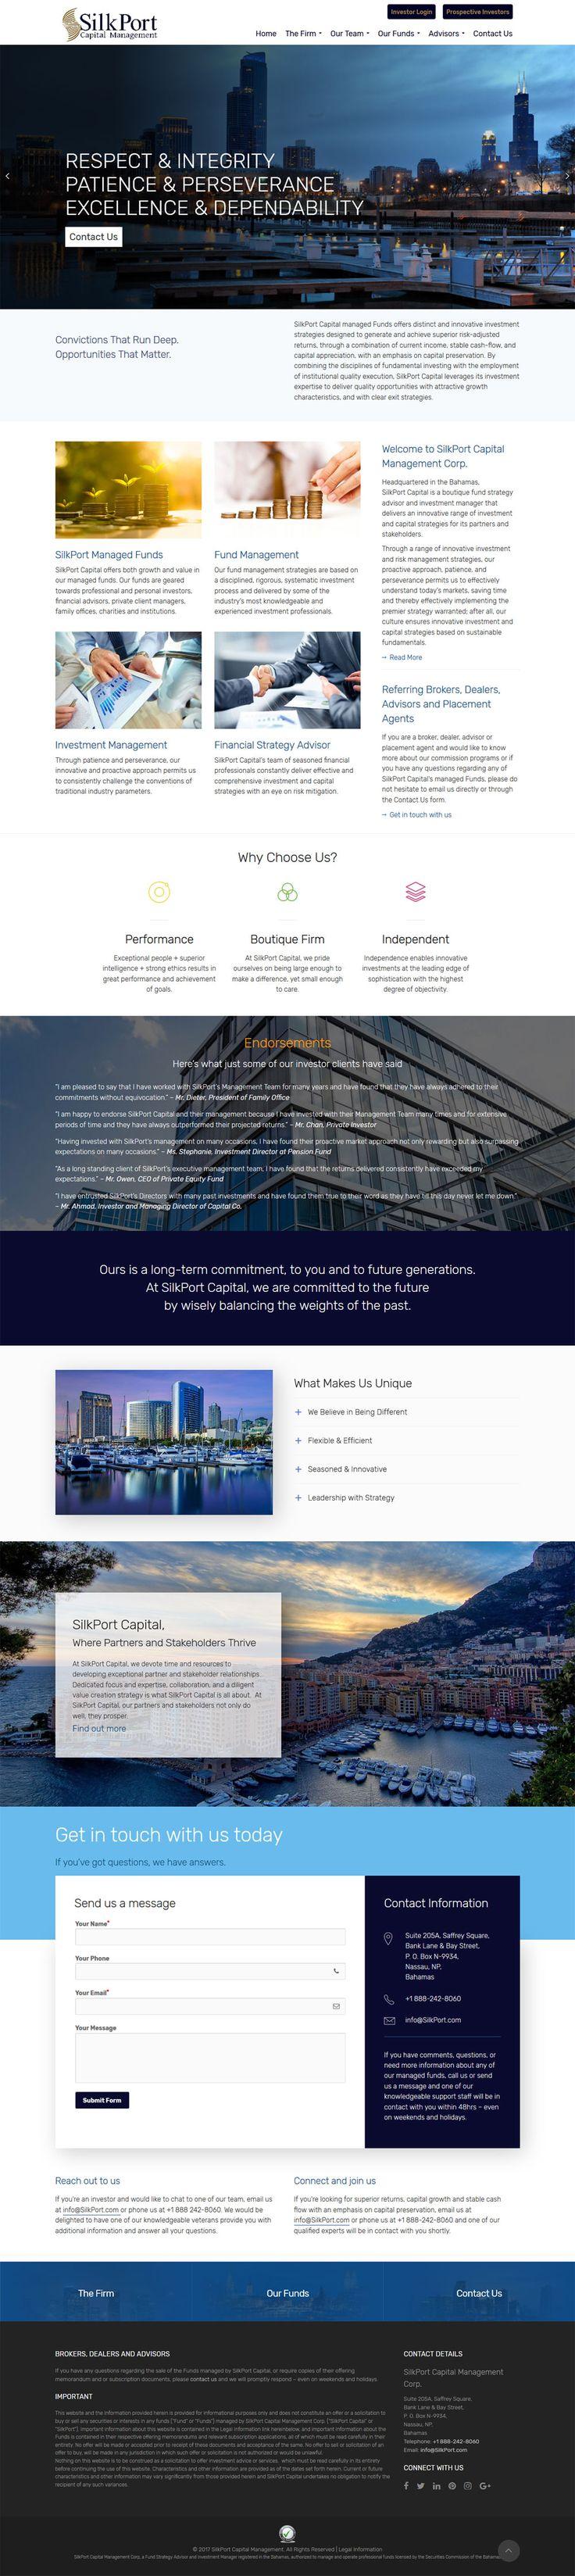 #WebDesign #Portfolio #SilkPortCapital Management  by Top #Website #Developers in #Brampton #Ontario